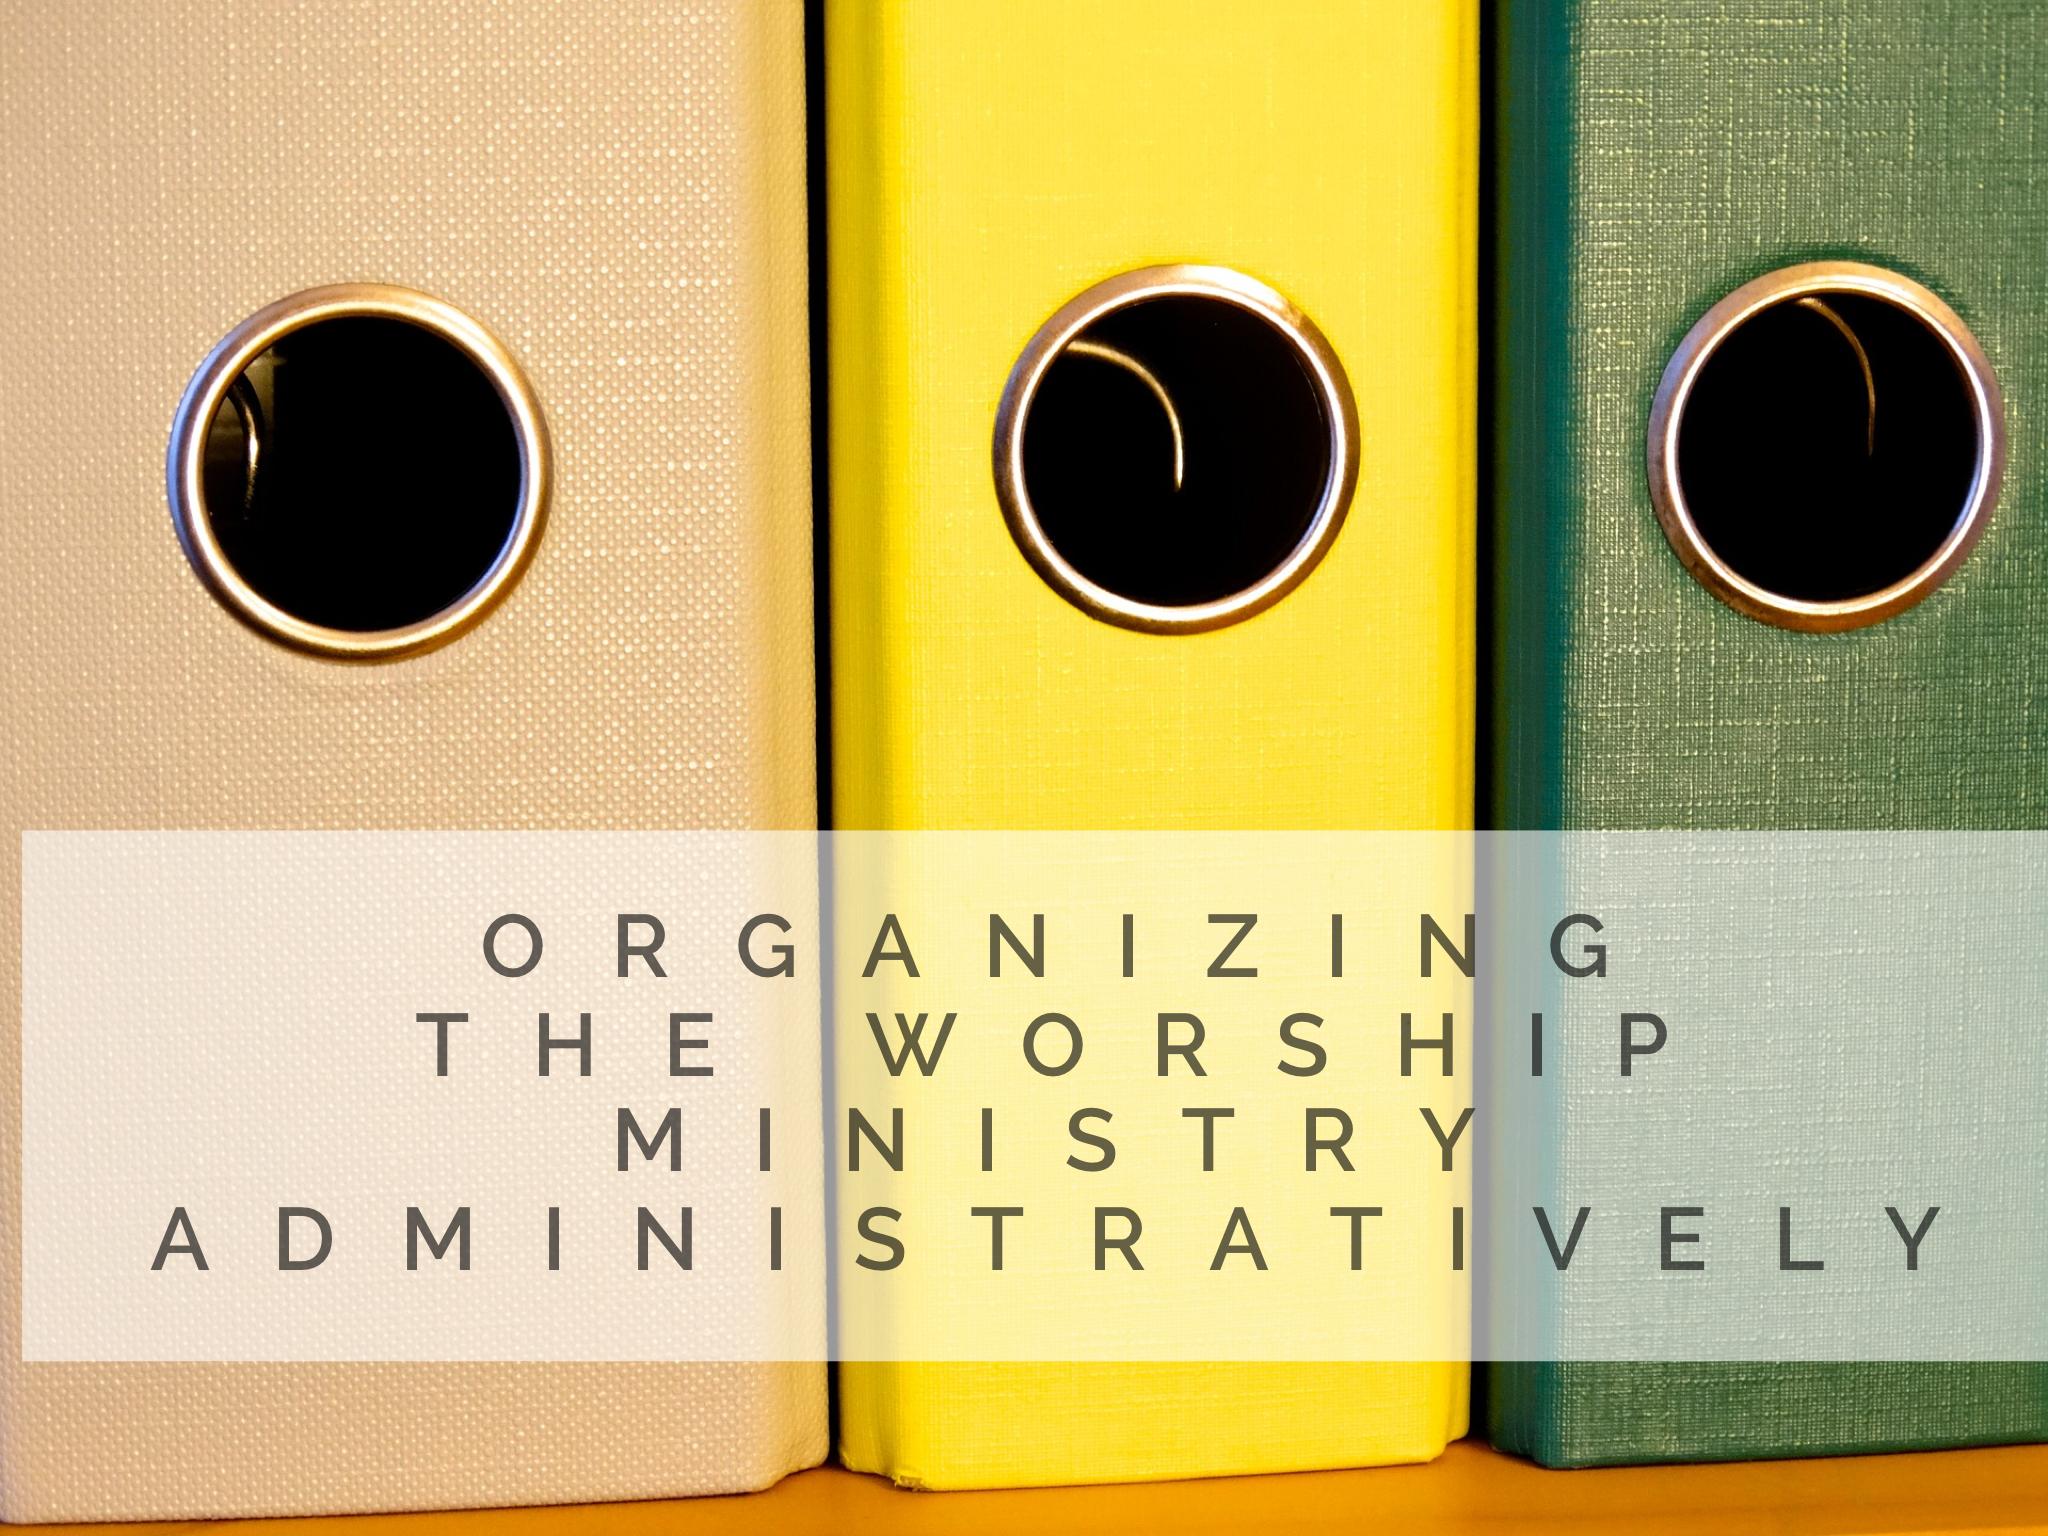 ORGANIZING THE WORSHIP MINISTRY